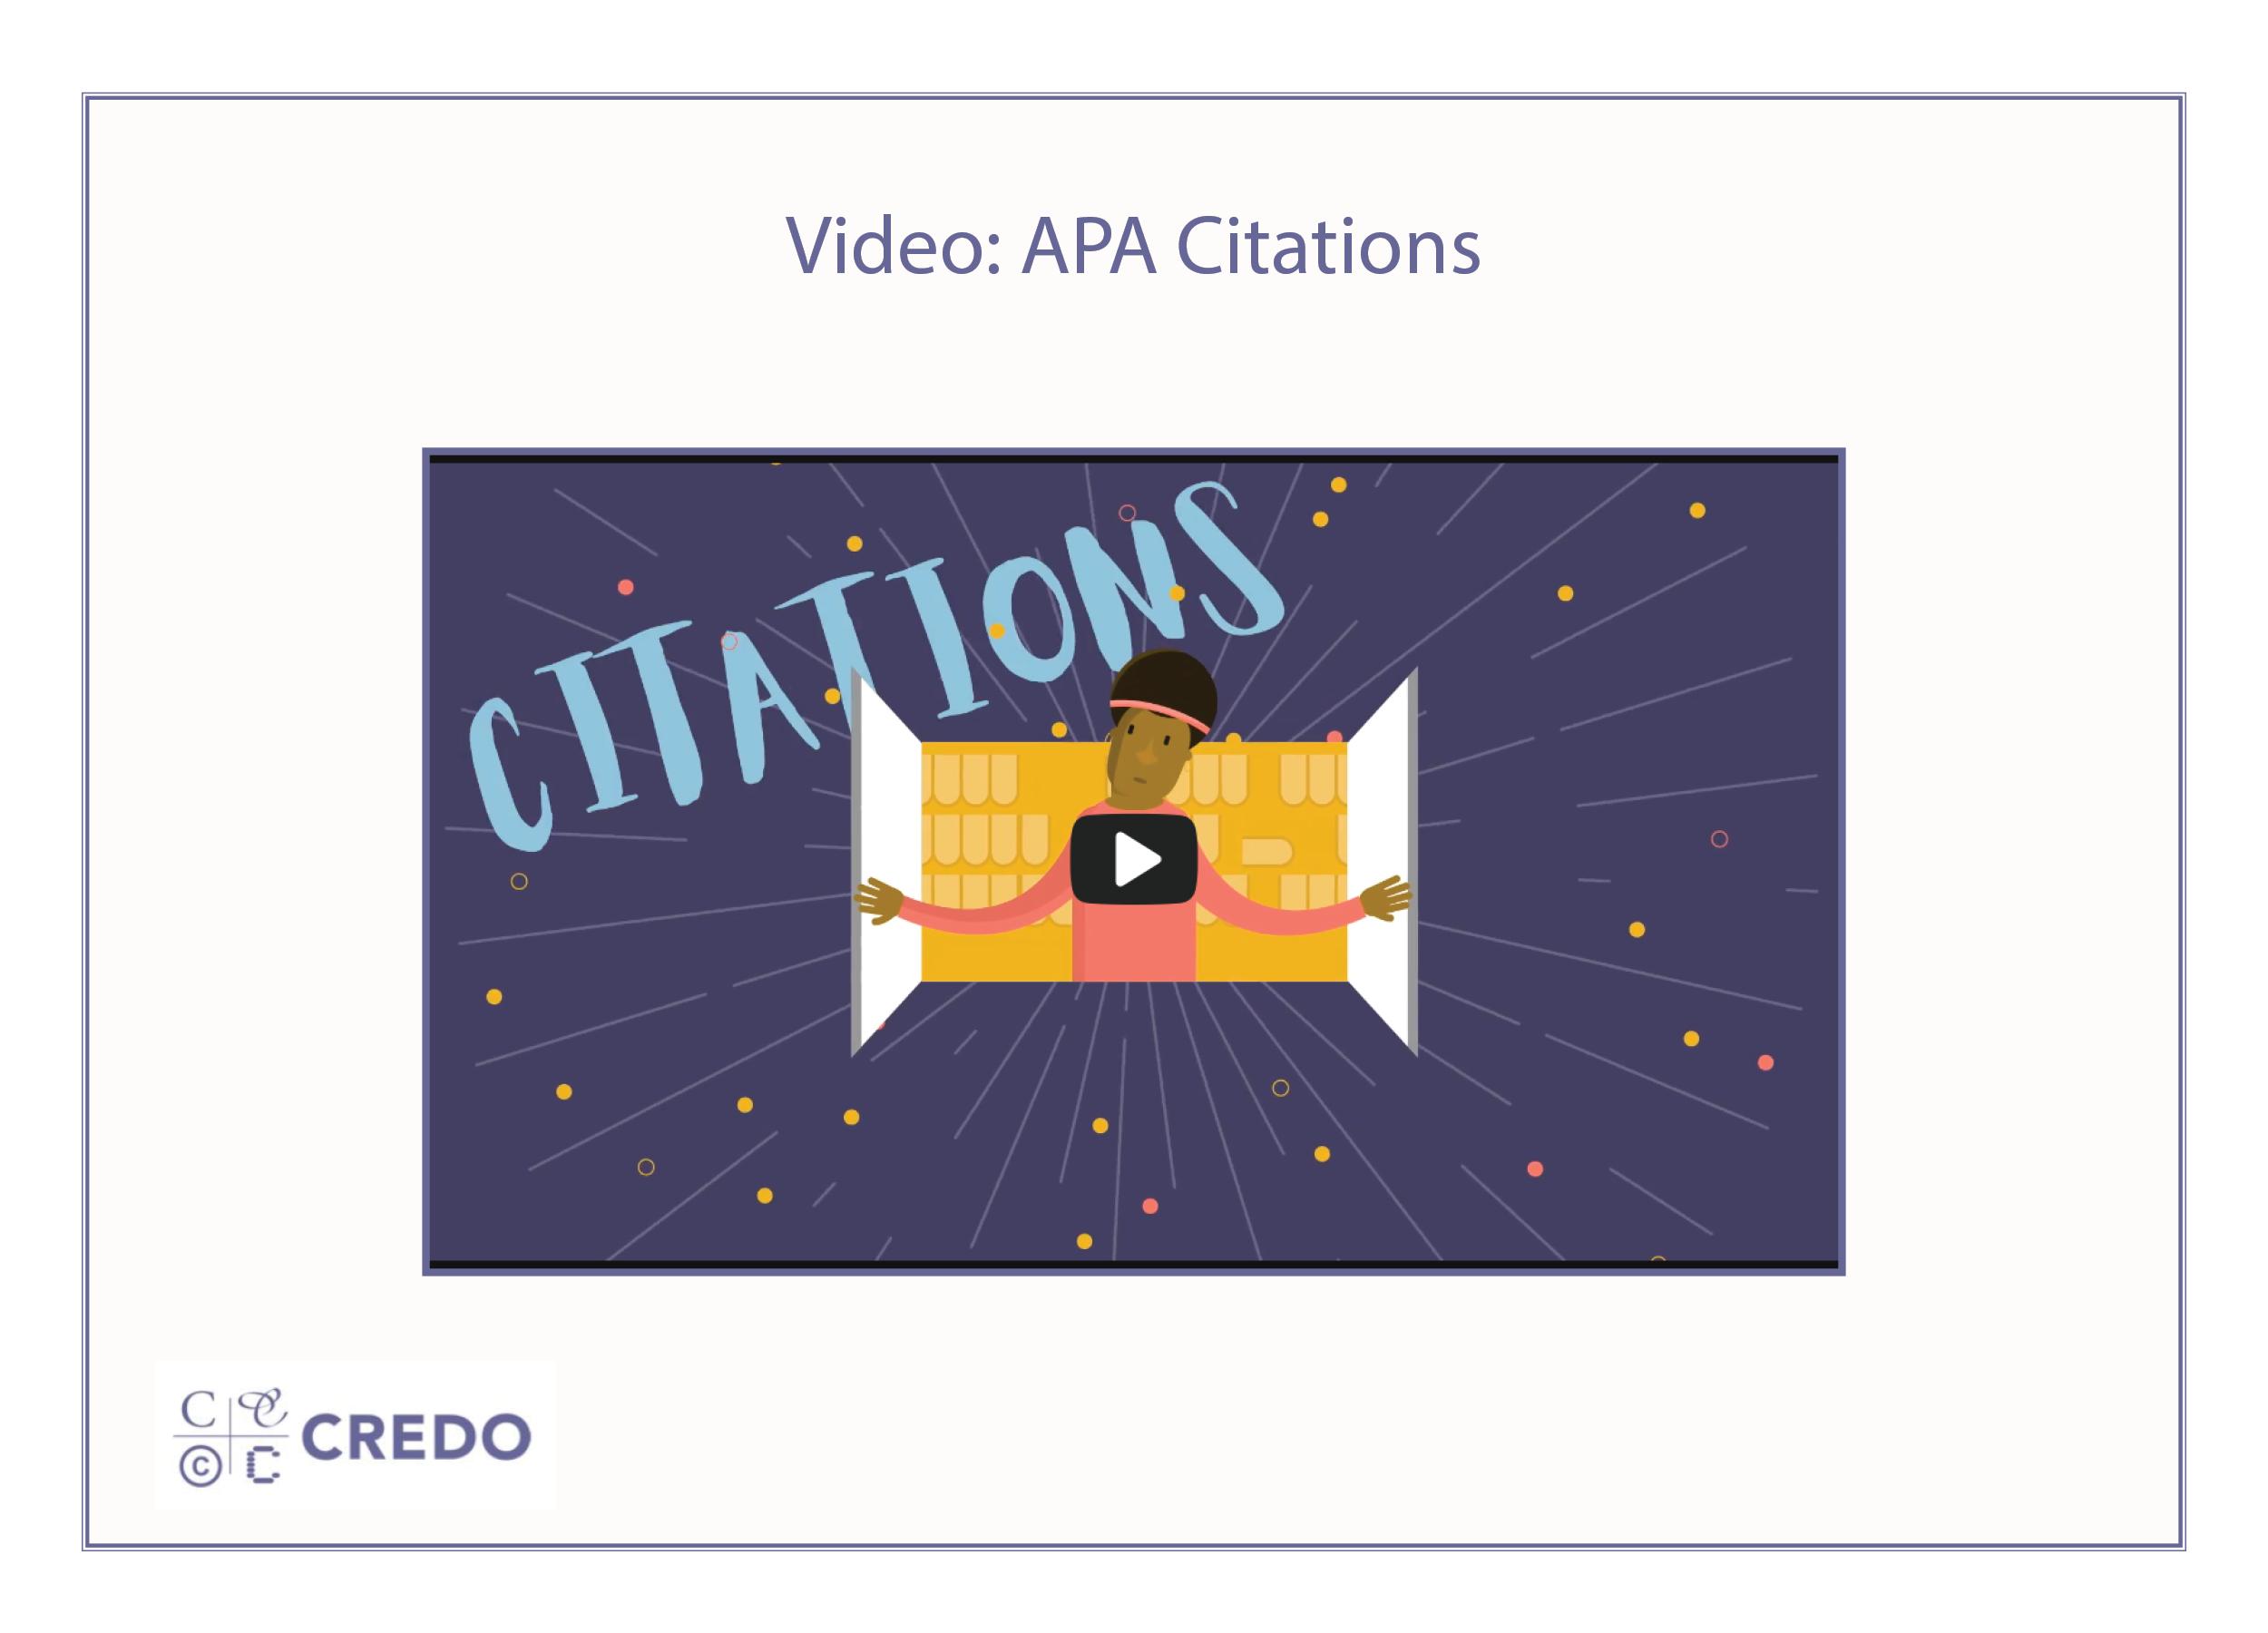 APA Citations Video